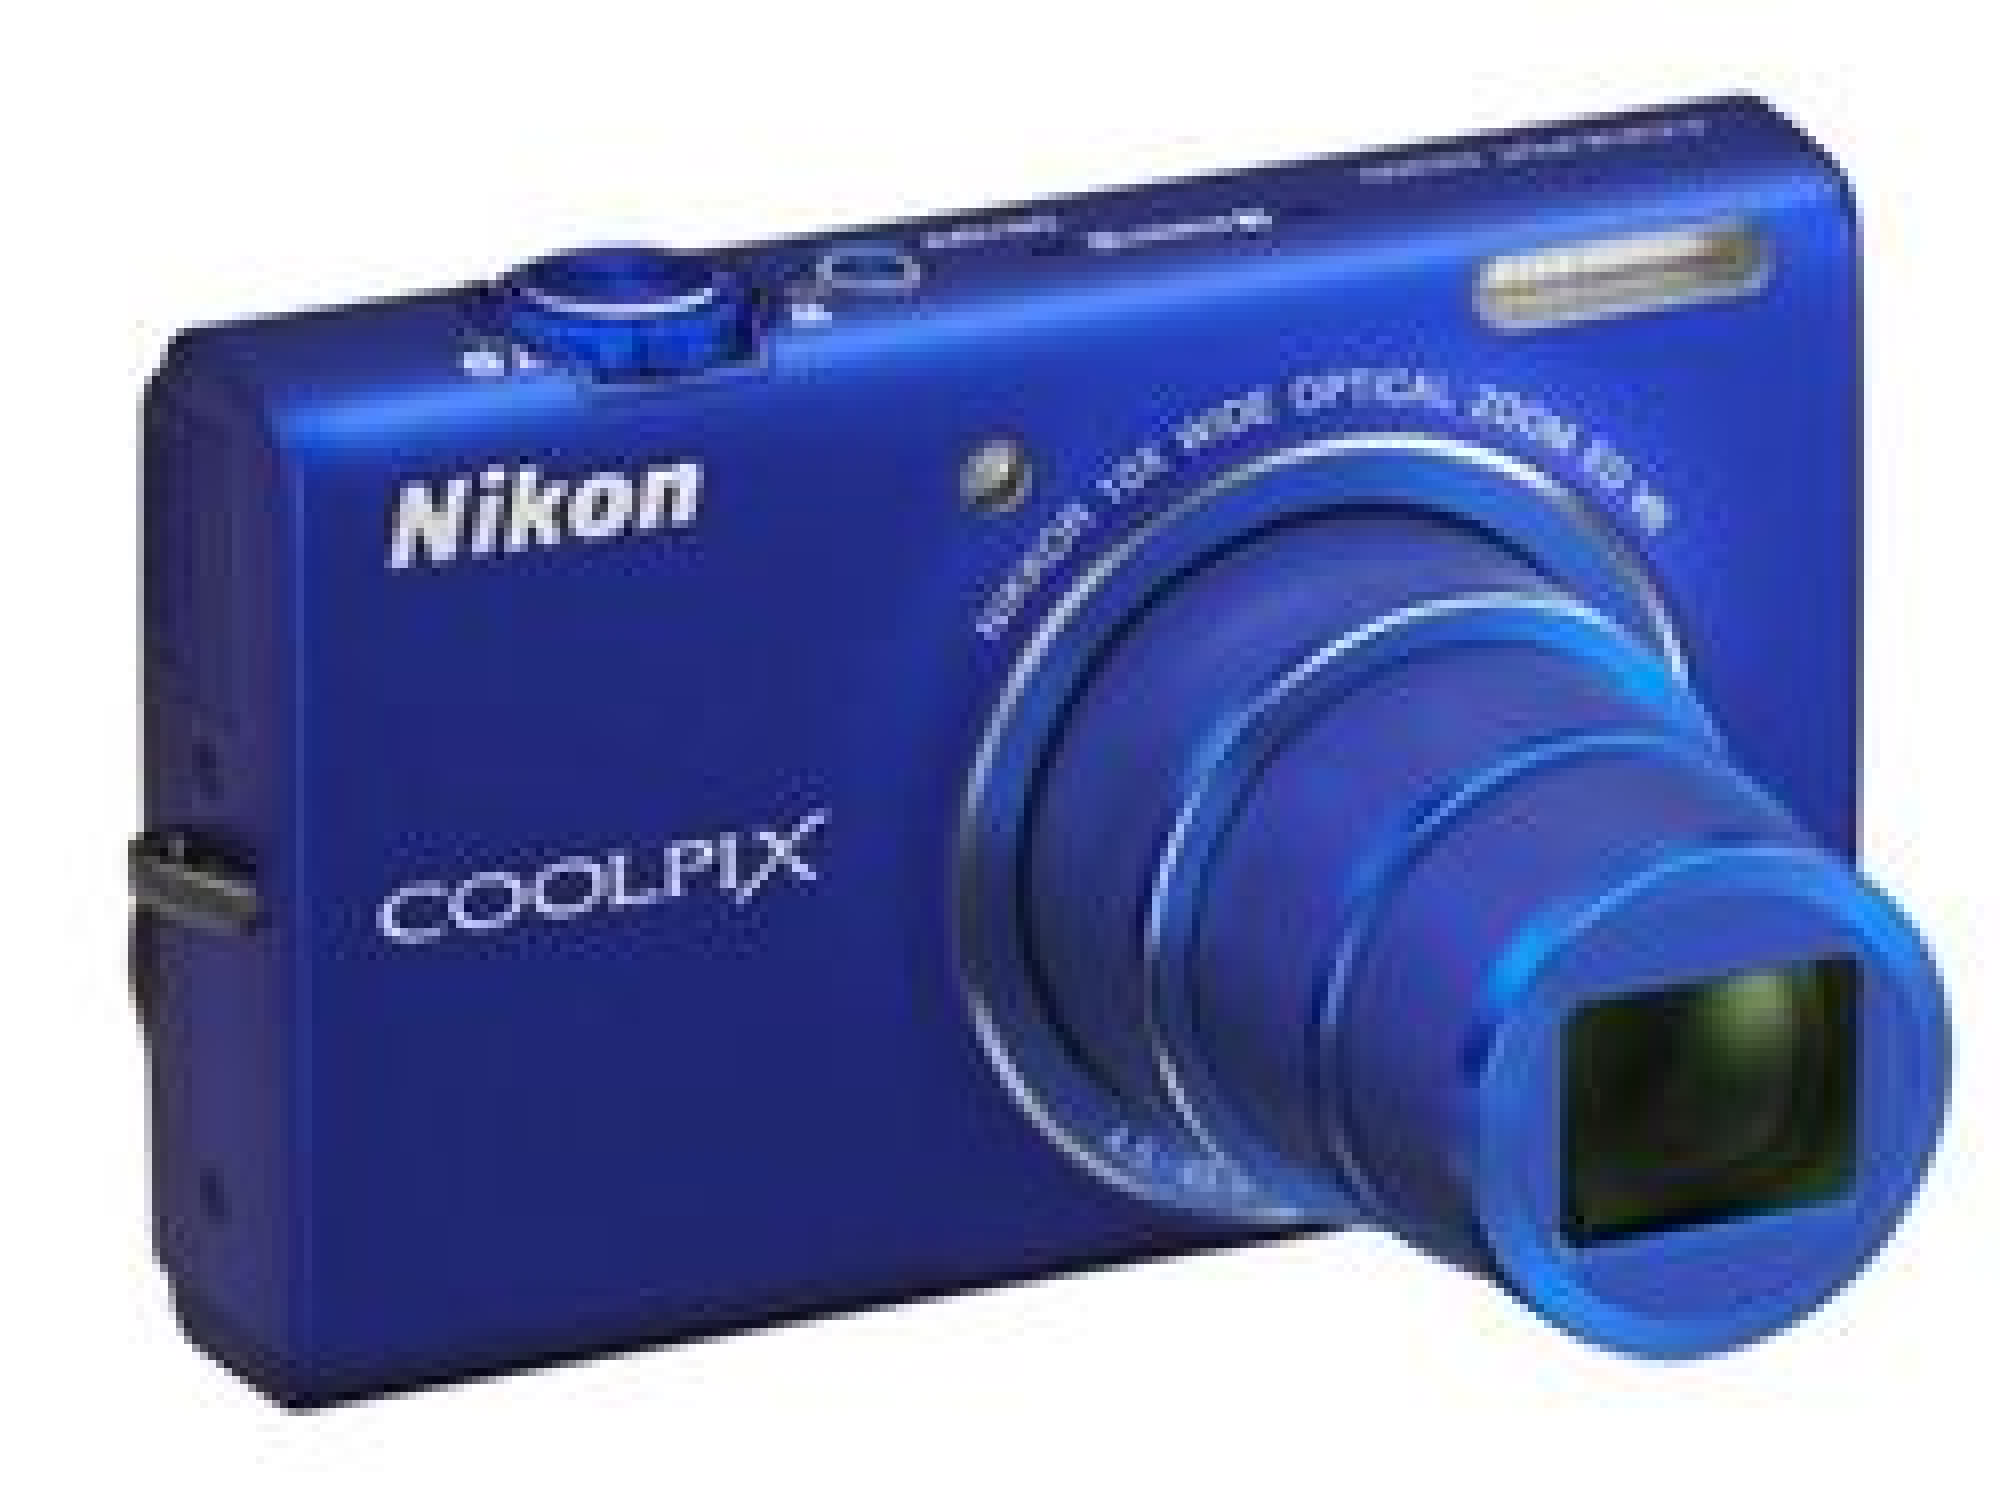 Nikon Coolpix S6200.